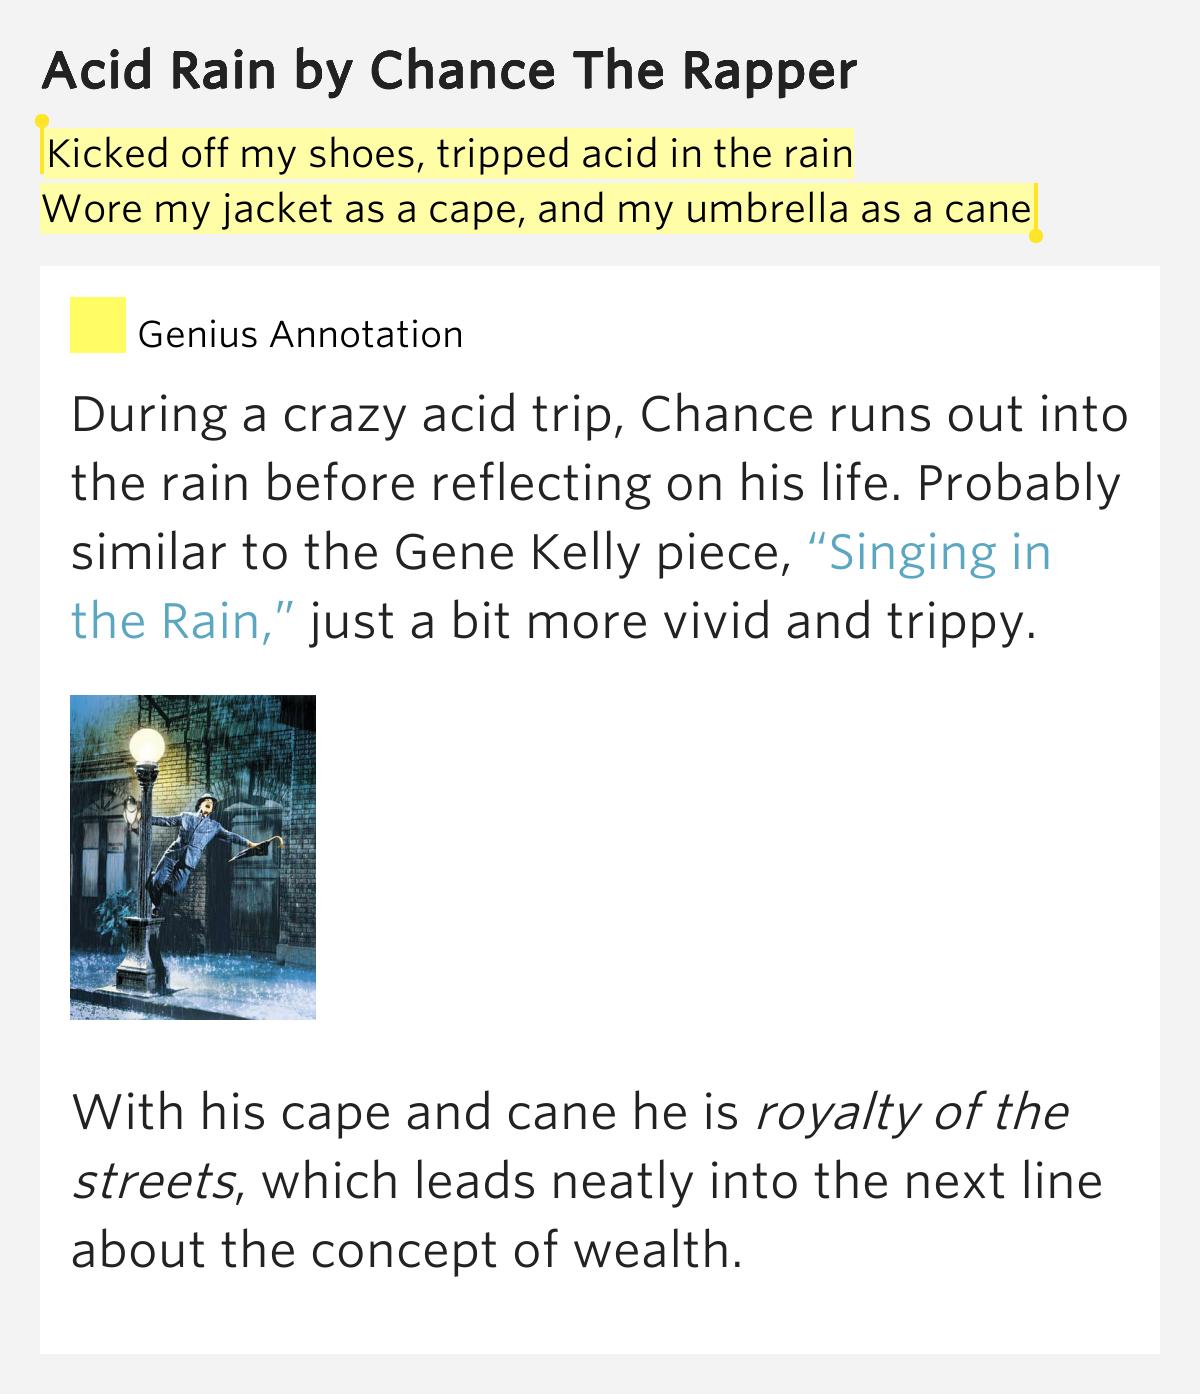 CHANCE THE RAPPER - ACID RAIN LYRICS